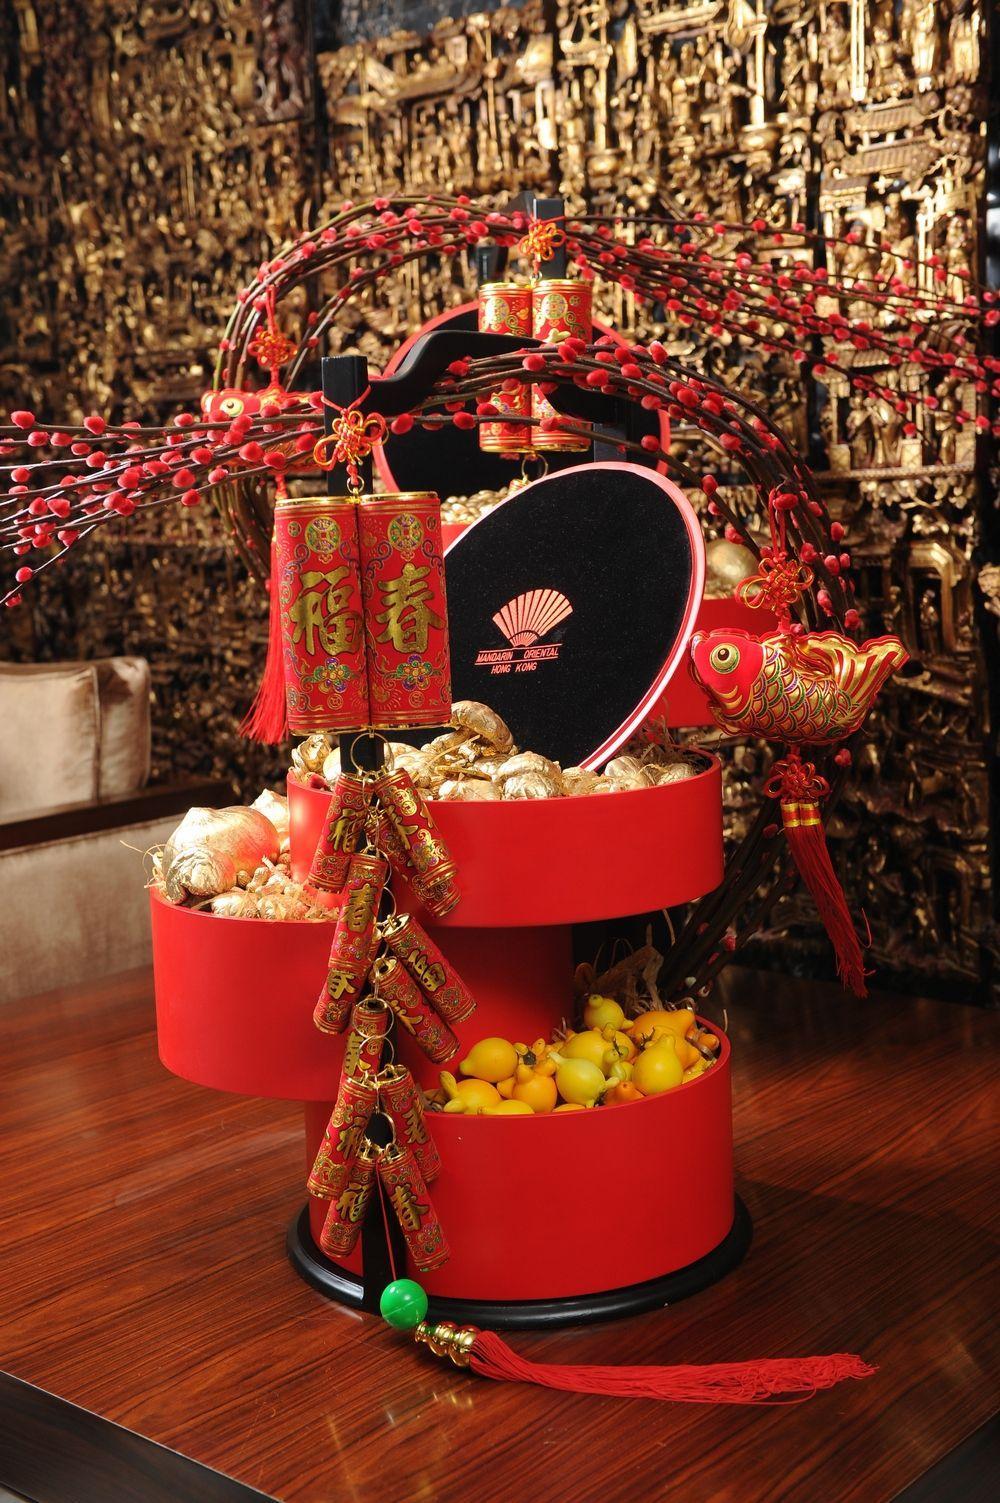 CNY Hampers 2014 at Mandarin Oriental, Hong Kong. (Có hình ...